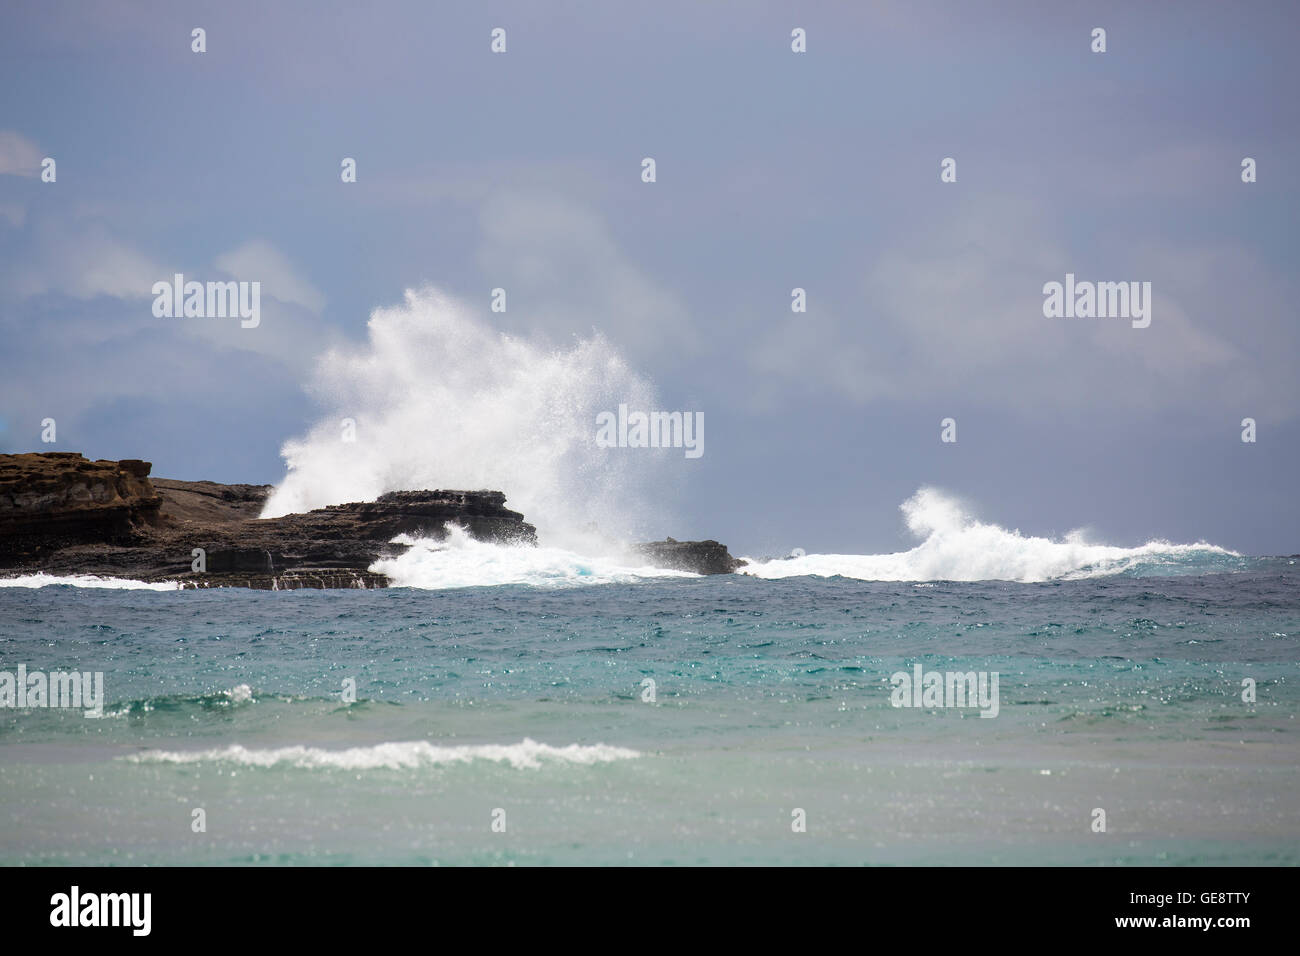 A wave crashing in Hanauma Bay, Hawaii - Stock Image